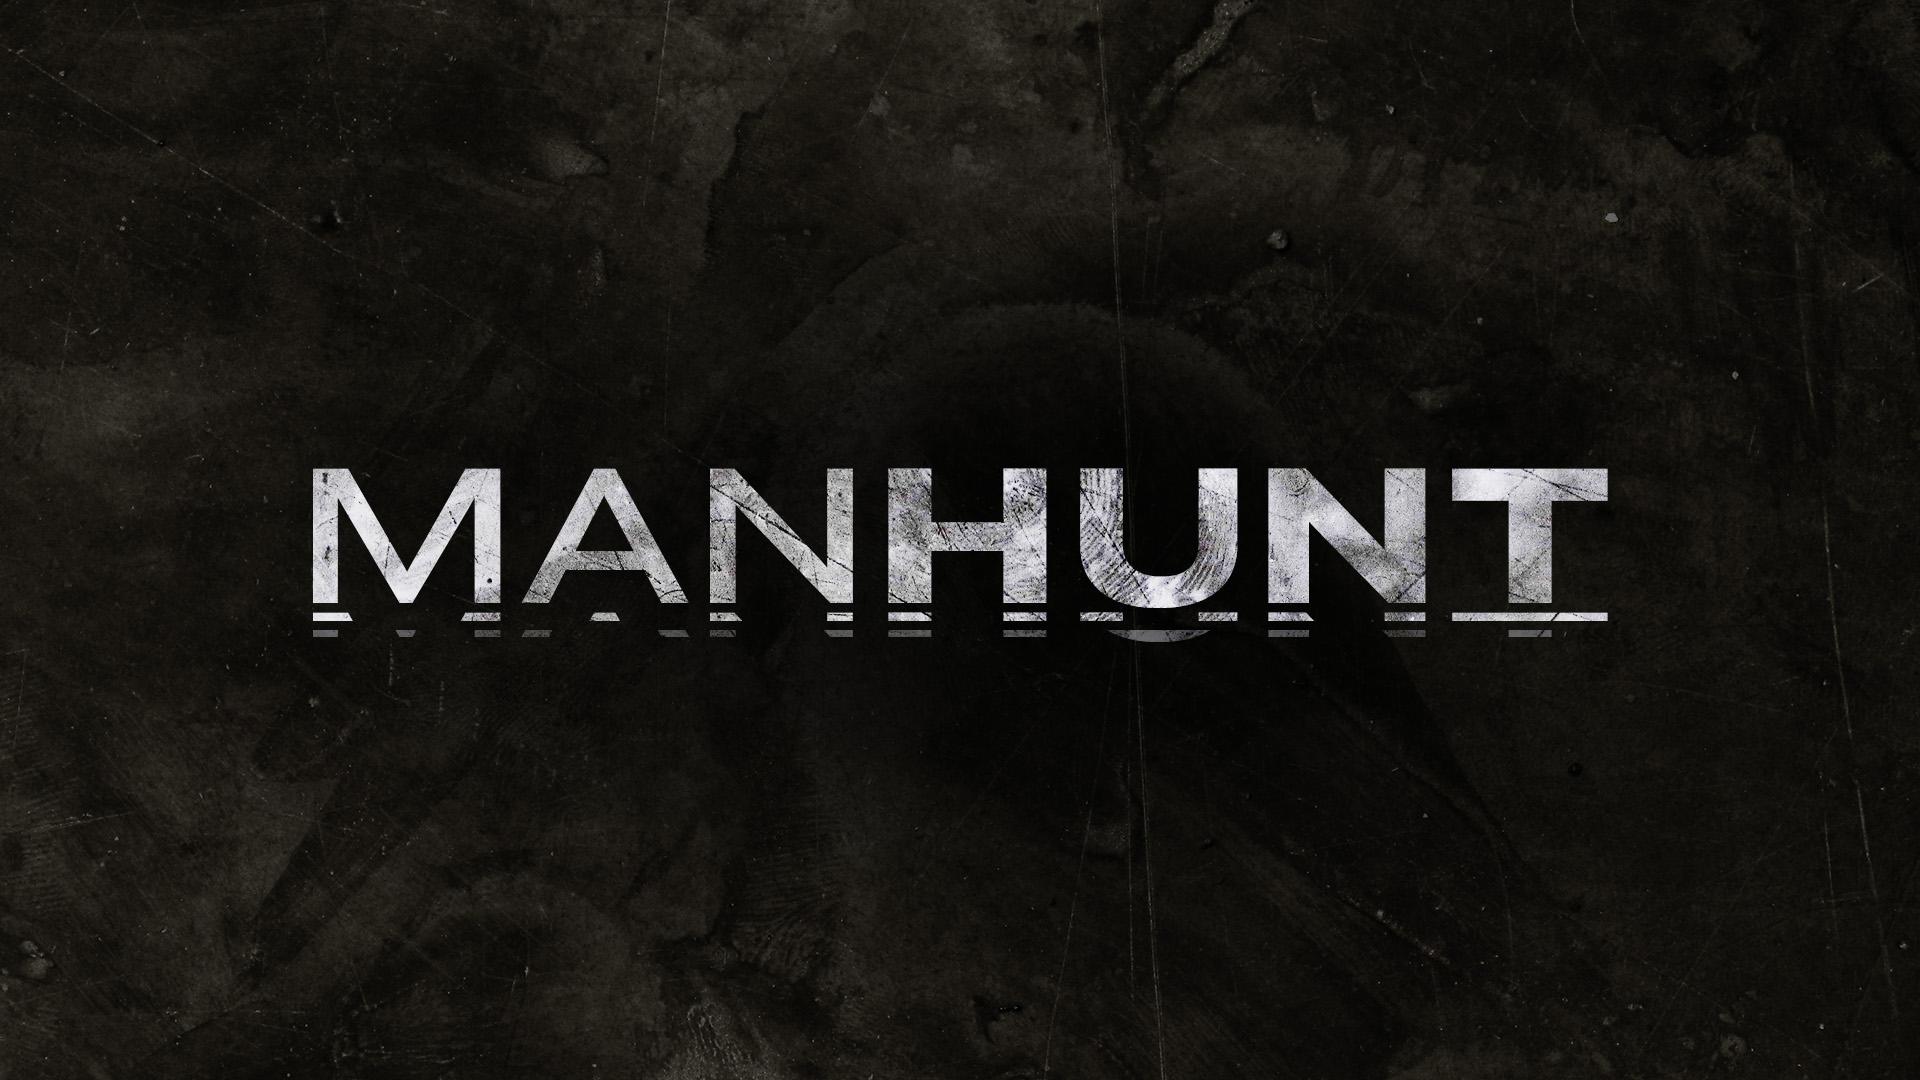 xManhunt_V2_3.jpg